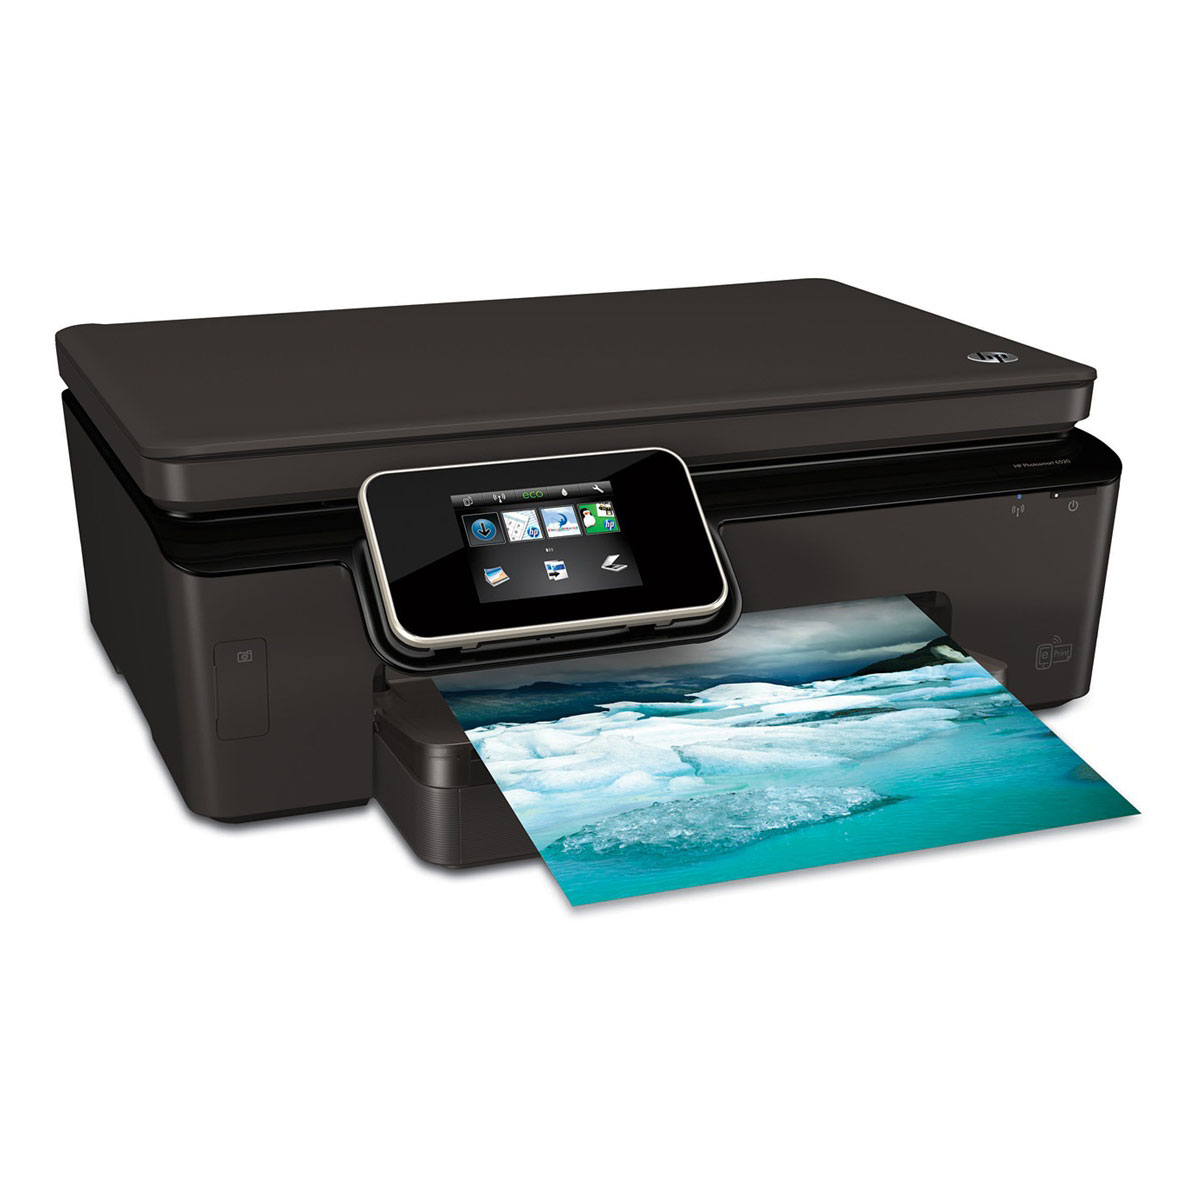 hp photosmart eaio 6520 imprimante multifonction hp sur. Black Bedroom Furniture Sets. Home Design Ideas